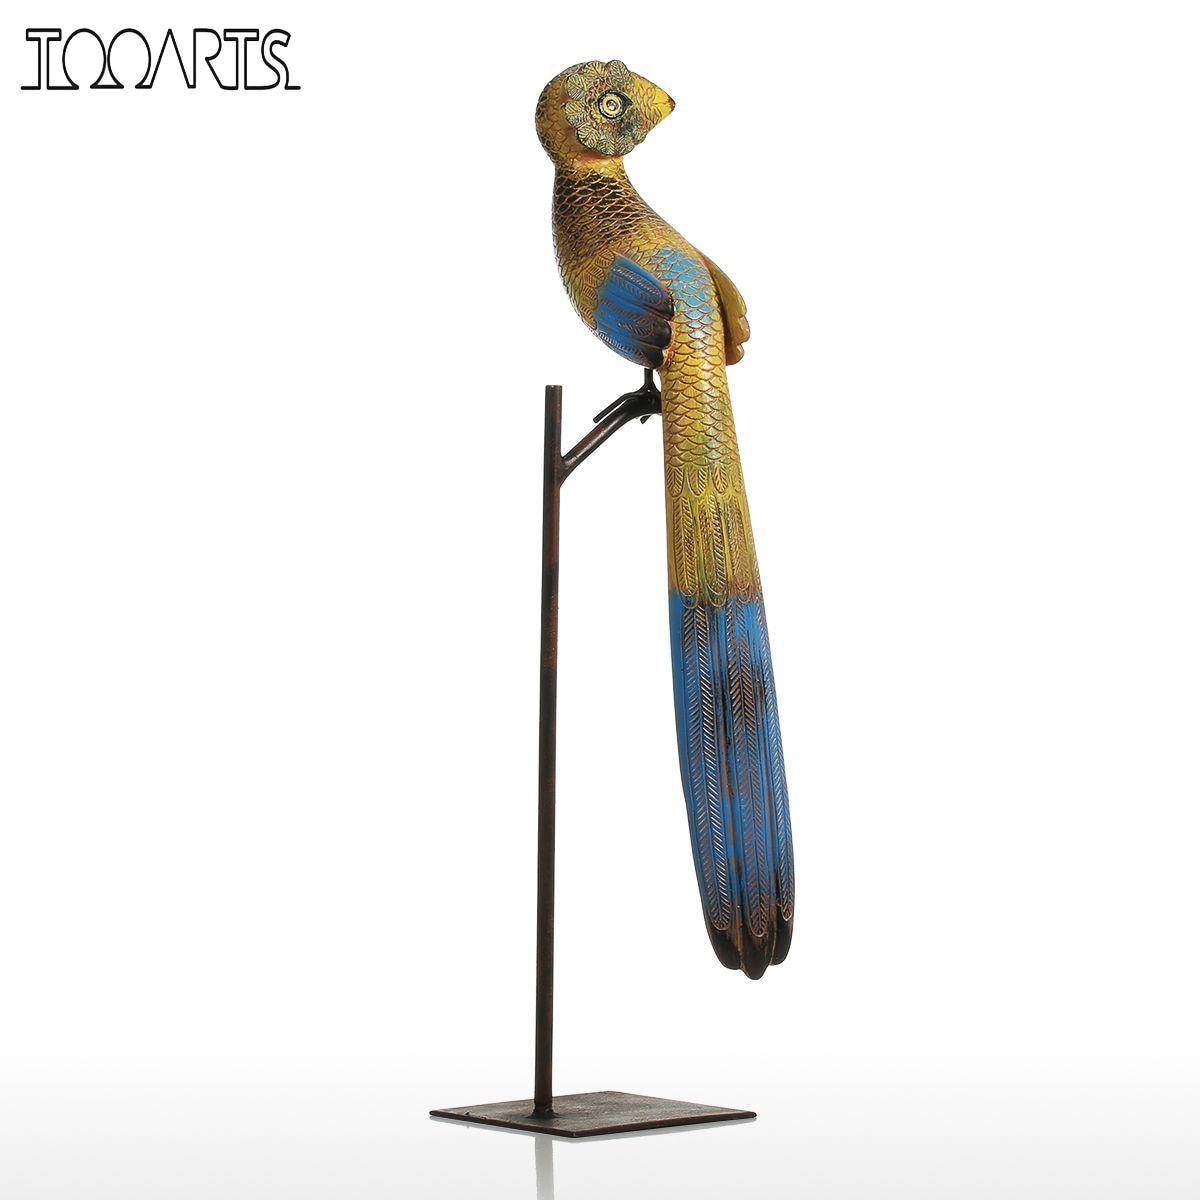 Tooarts escultura de resina de pájaro de cola larga, ornamento de fibra de vidrio, estatua de decoración para el hogar, figurita exagerada abstracta, arte moderno